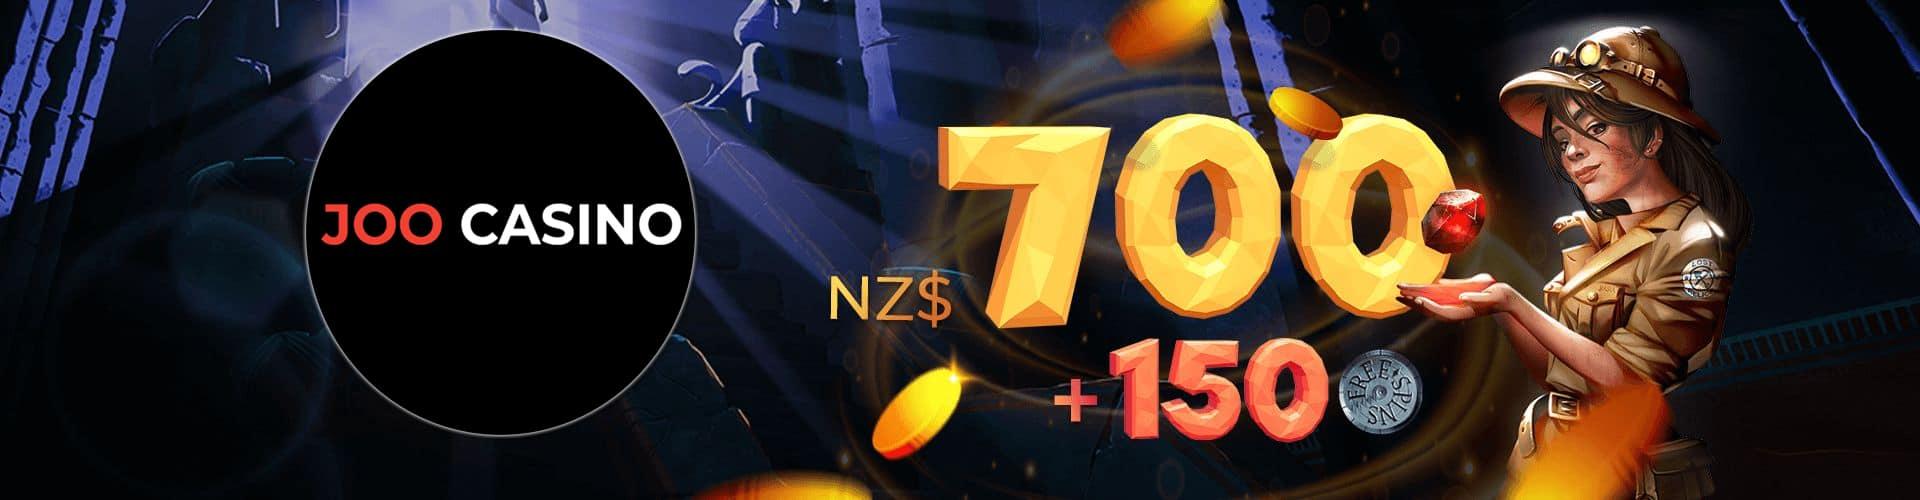 Joo Casino Bonus New Zealand